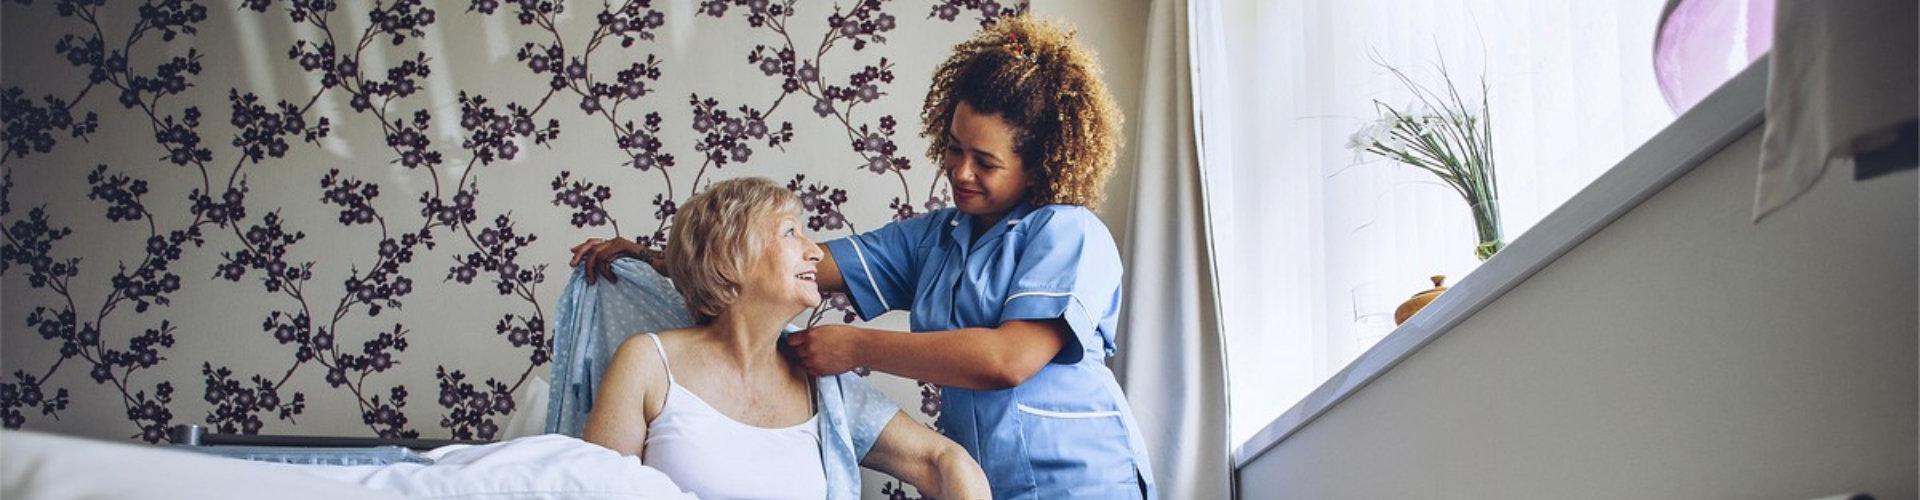 caregiver assisting senior woman to dress up